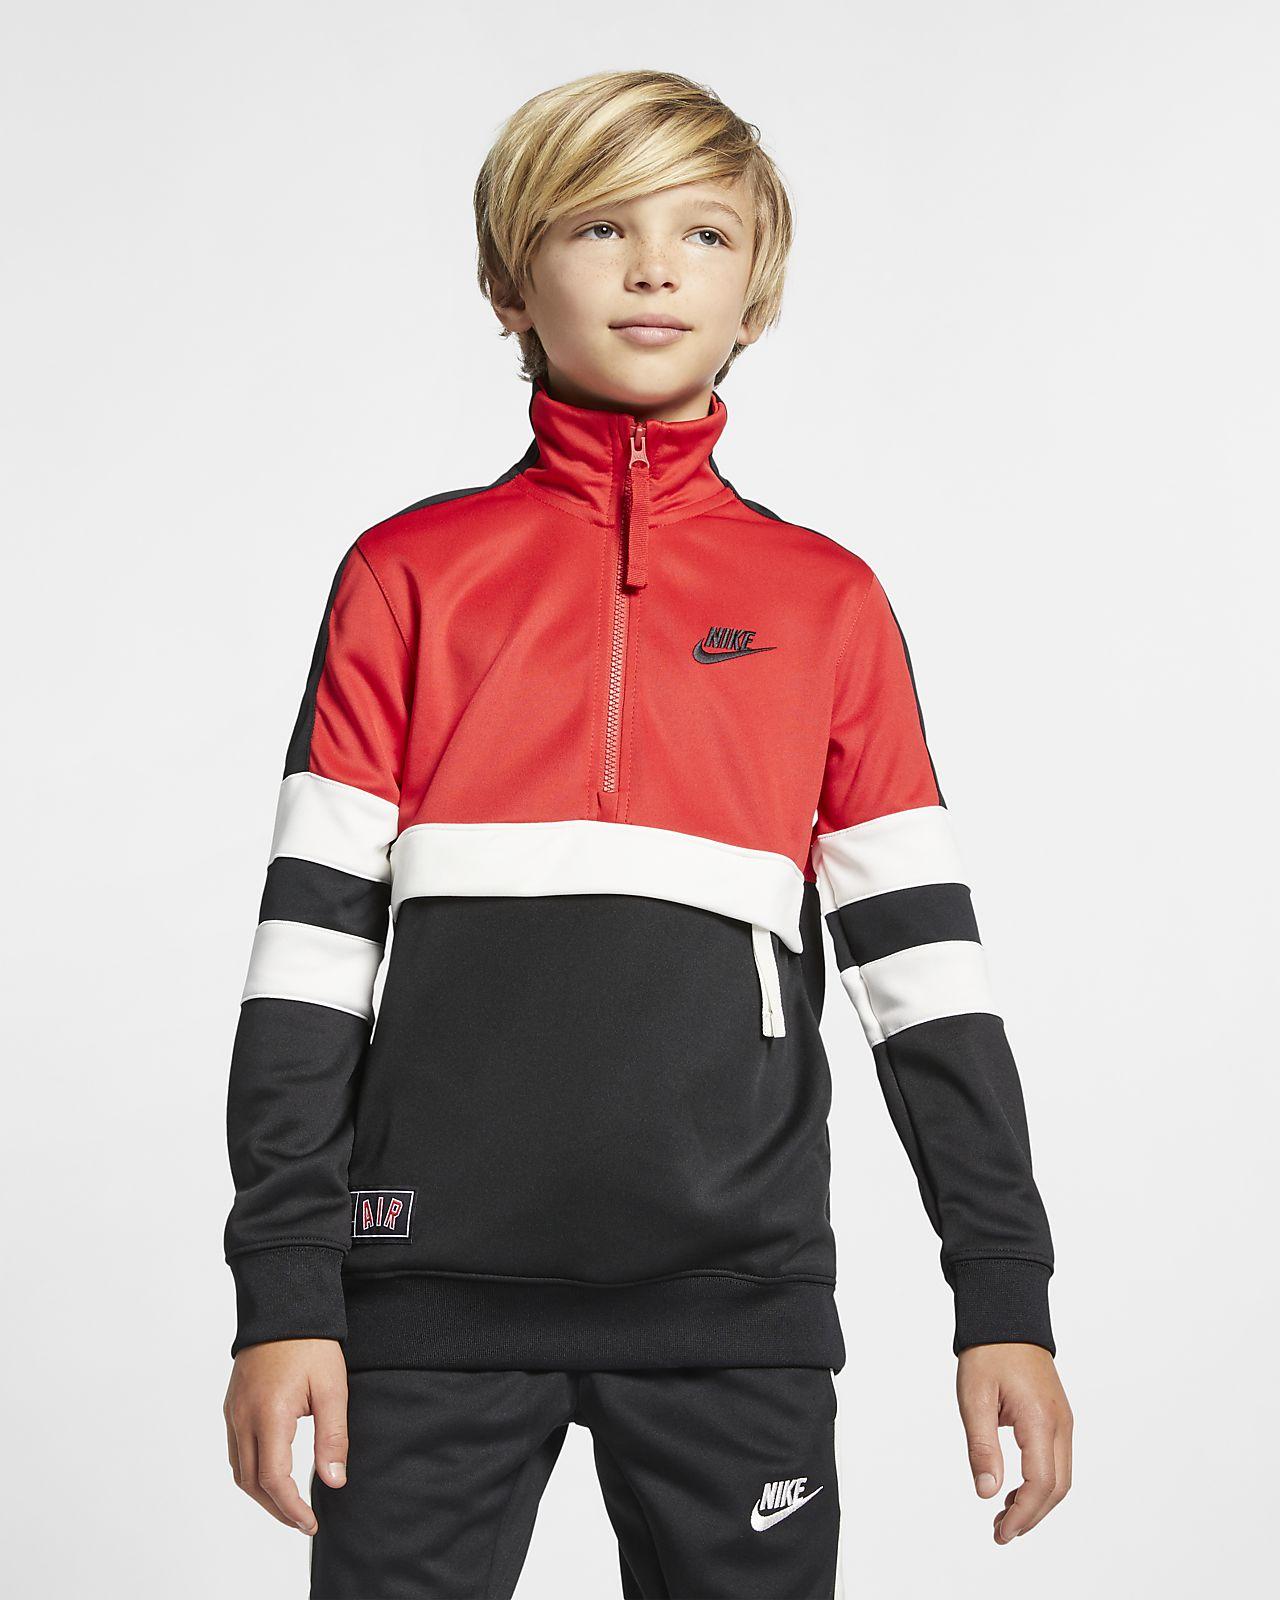 2a5e4299e Nike Air Older Kids' Tracksuit. Nike.com SE